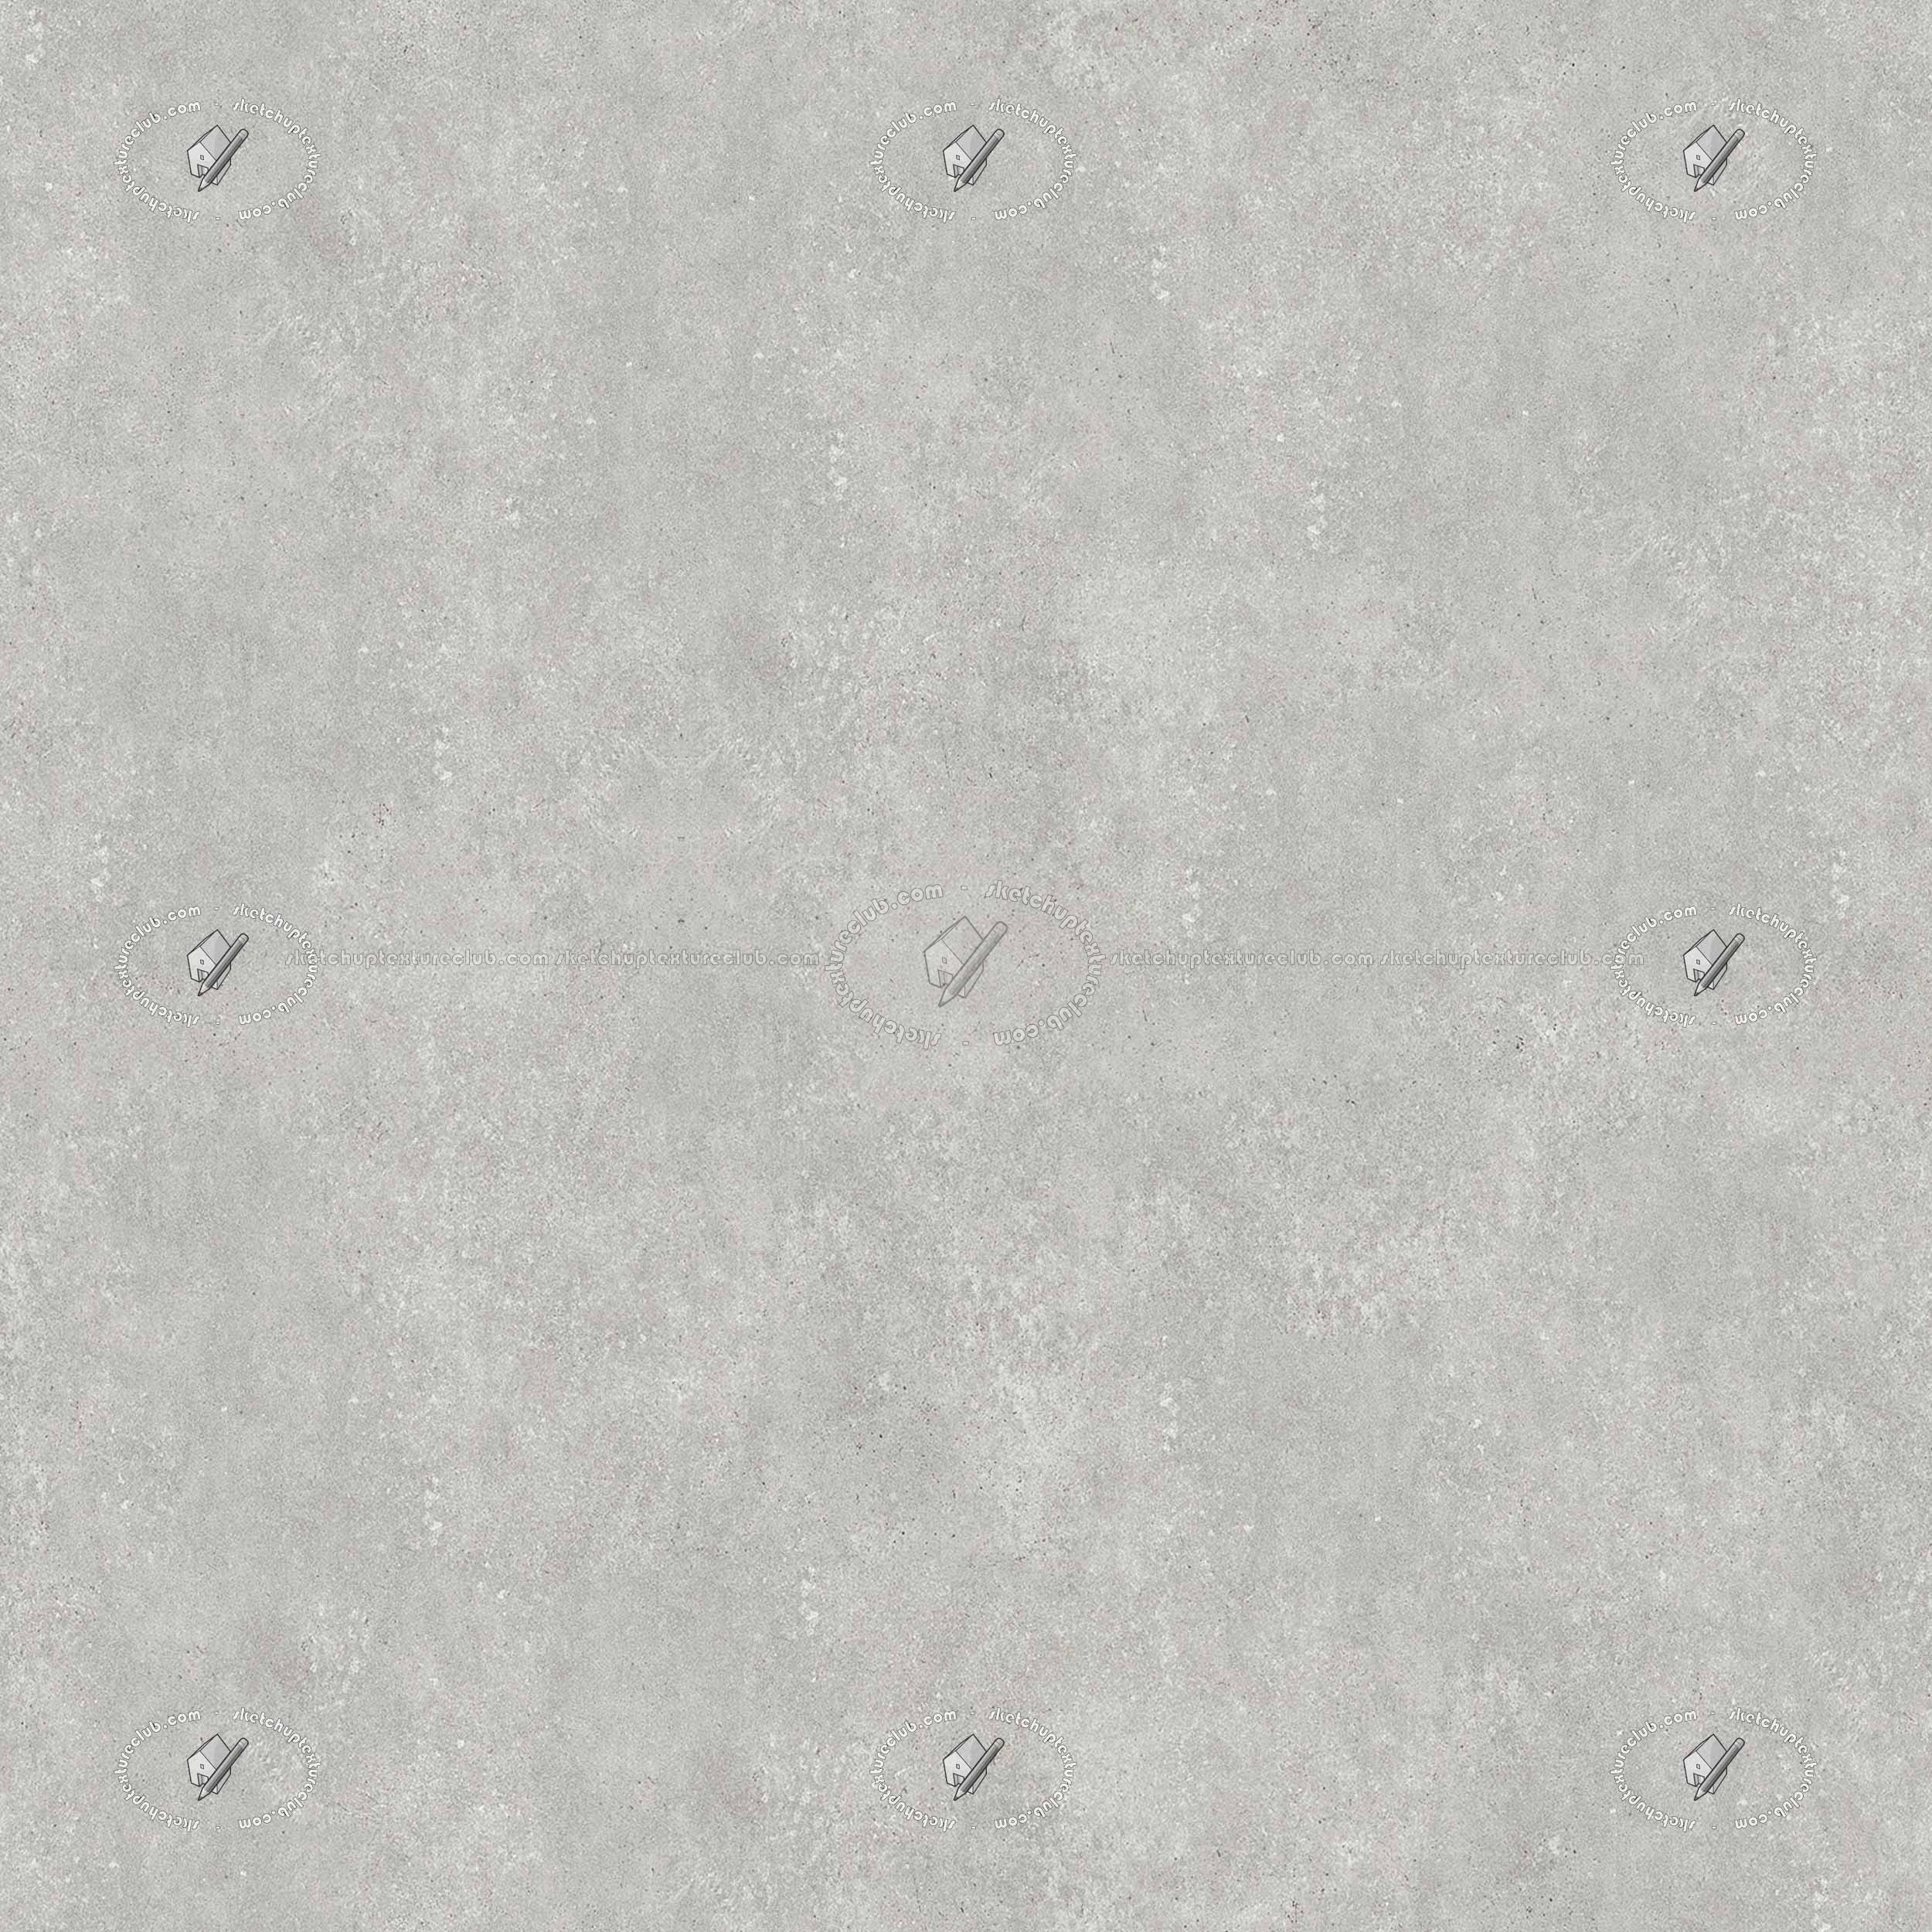 Concrete wall texture seamless 1 21198